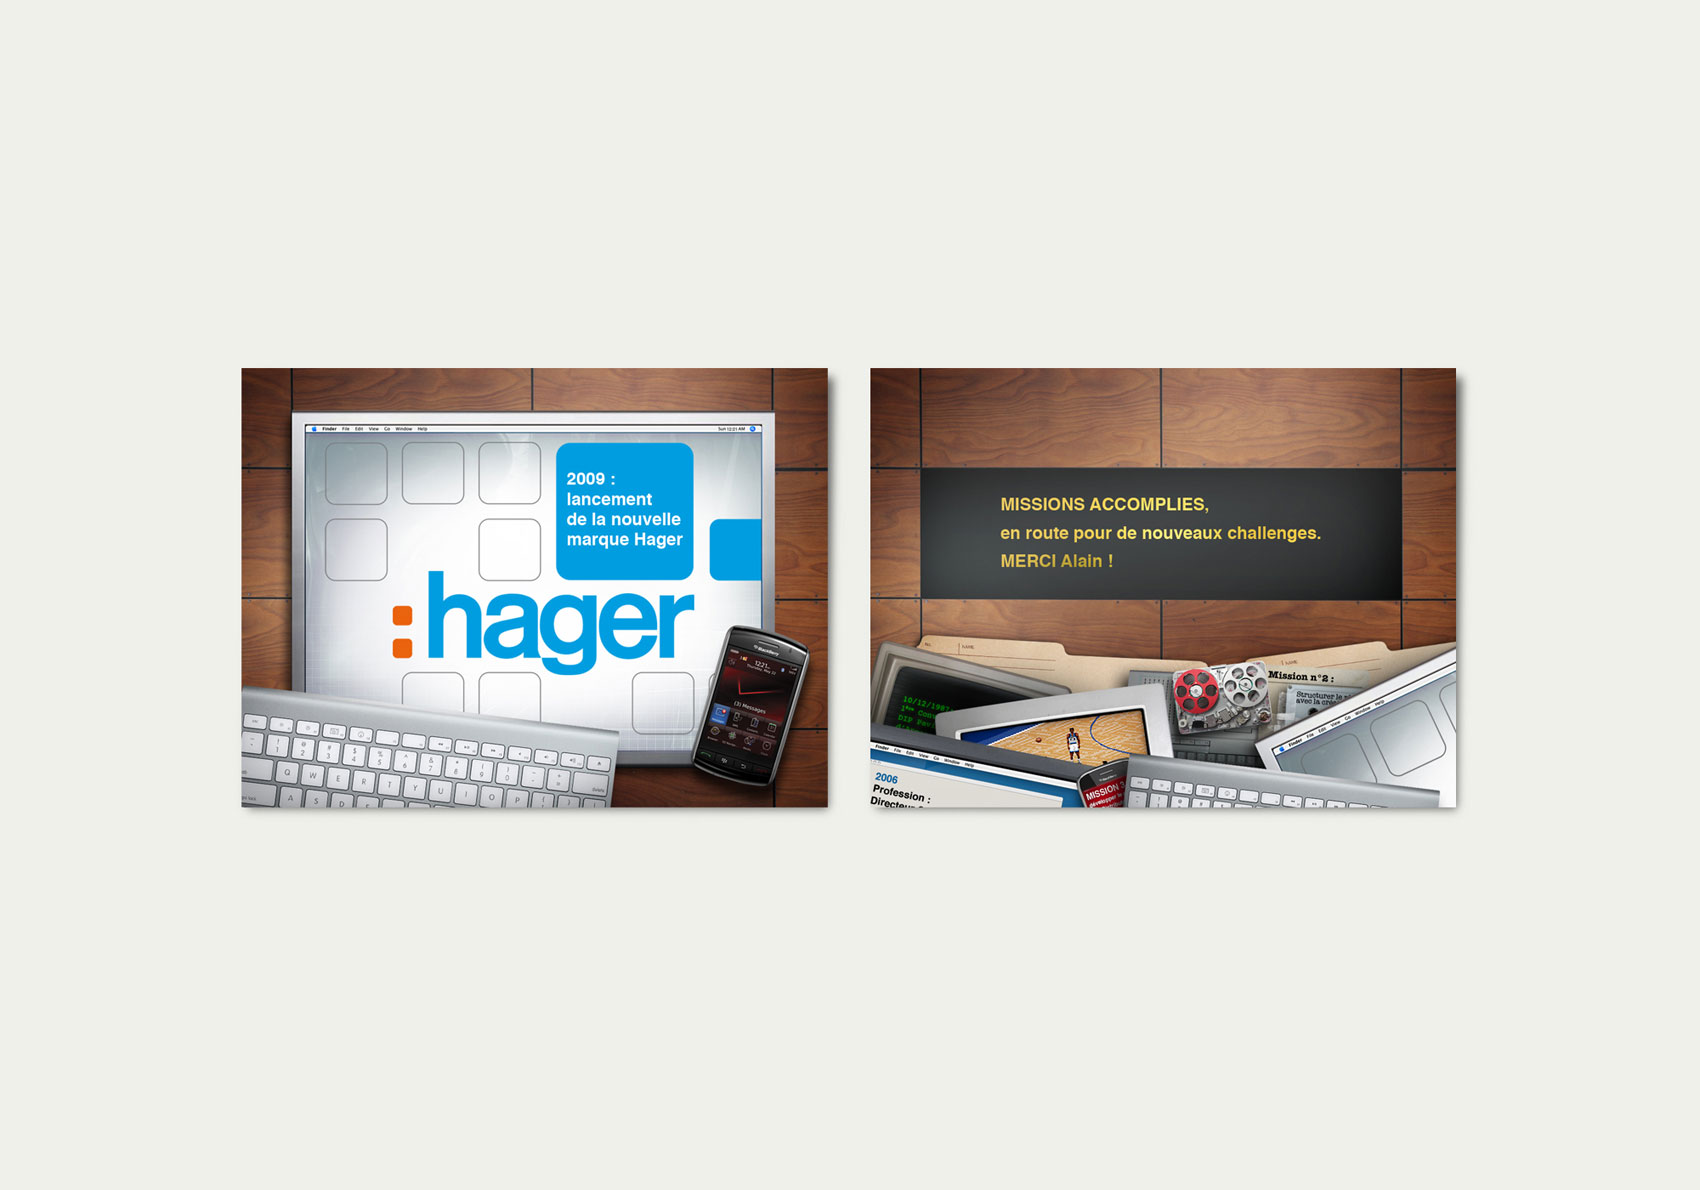 hager-hommage-alain-saint-michel-4